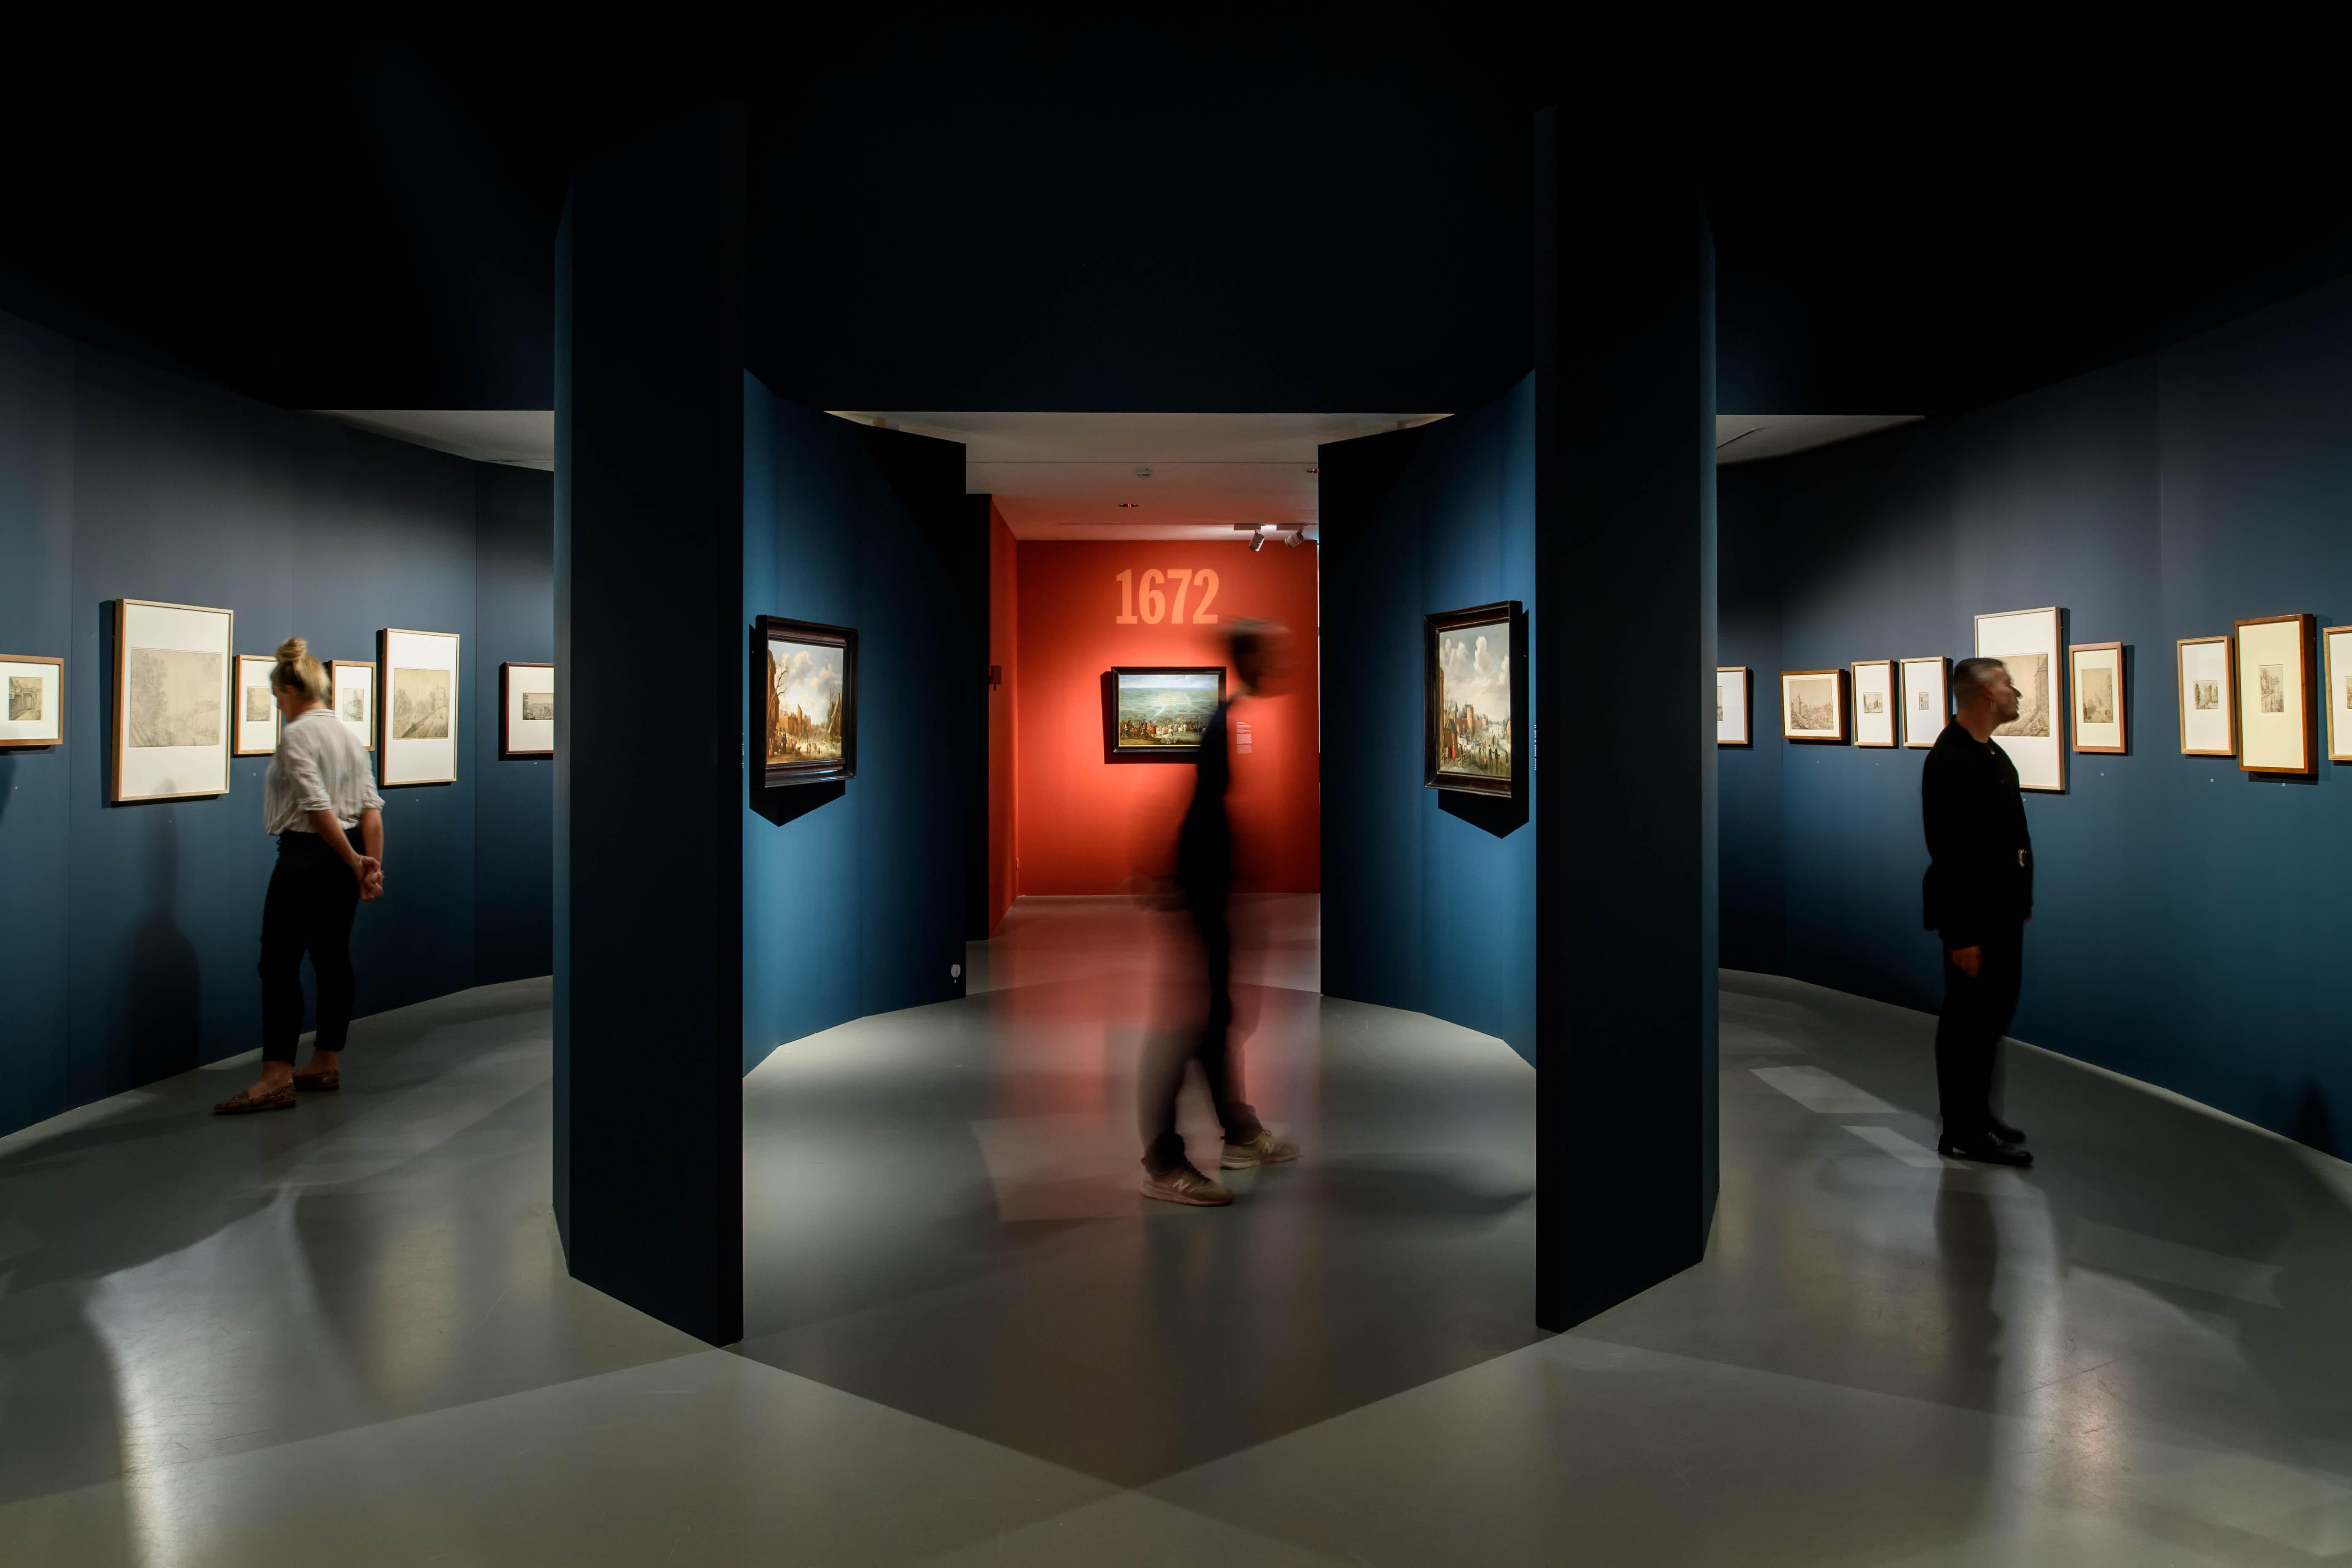 tentoonstelling de ommuurde stad centraal museum 3 7 jpg